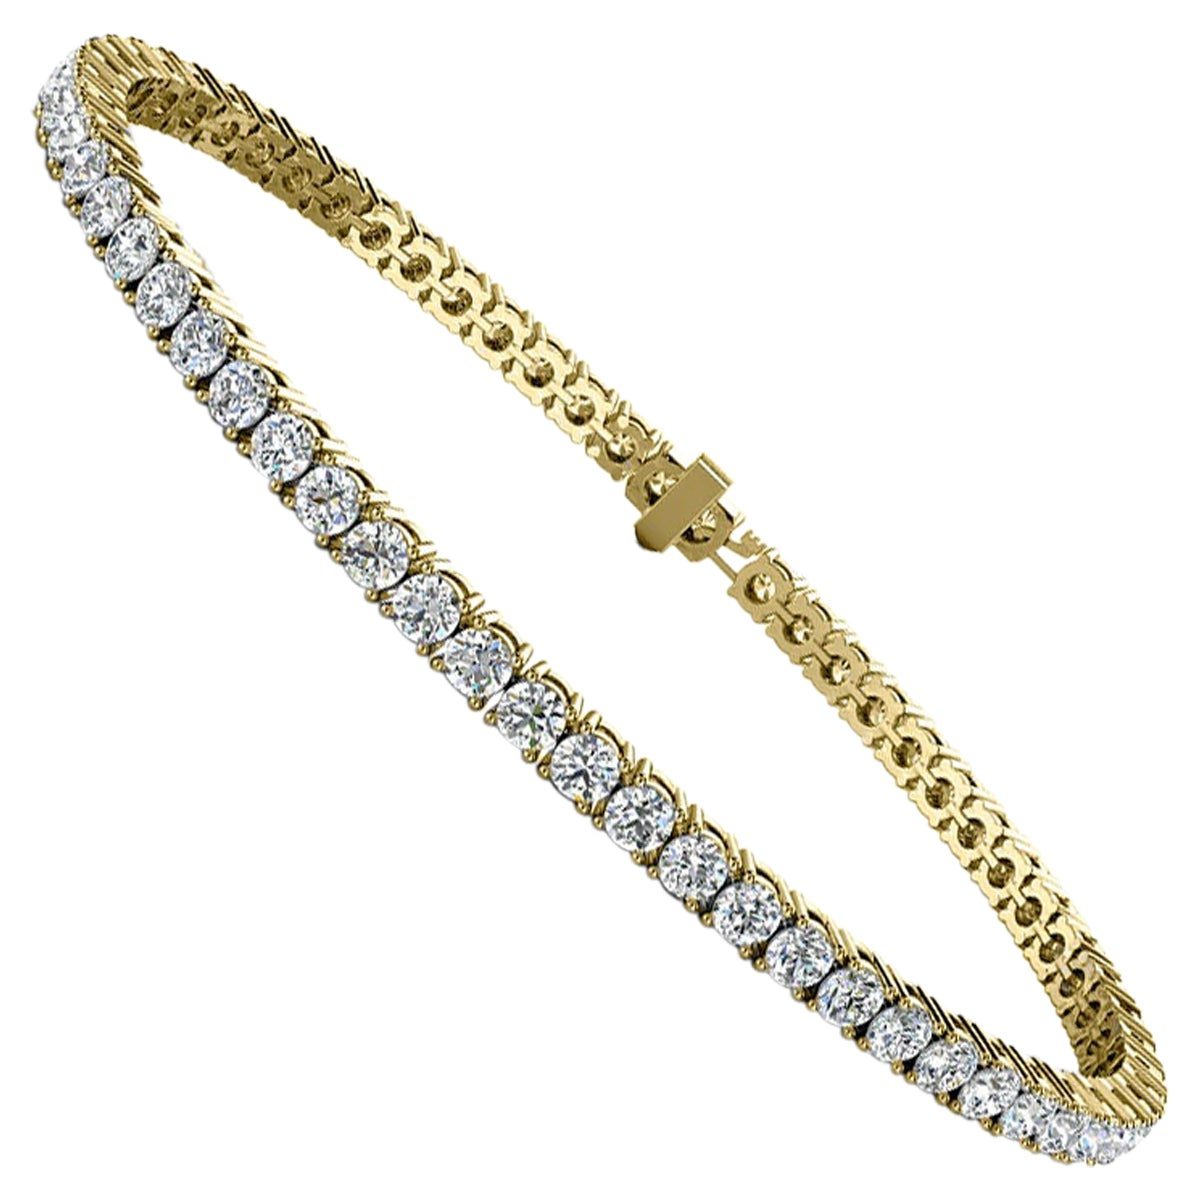 18 Karat Yellow Gold Four Prongs Diamond Tennis Bracelet '4 Carat'